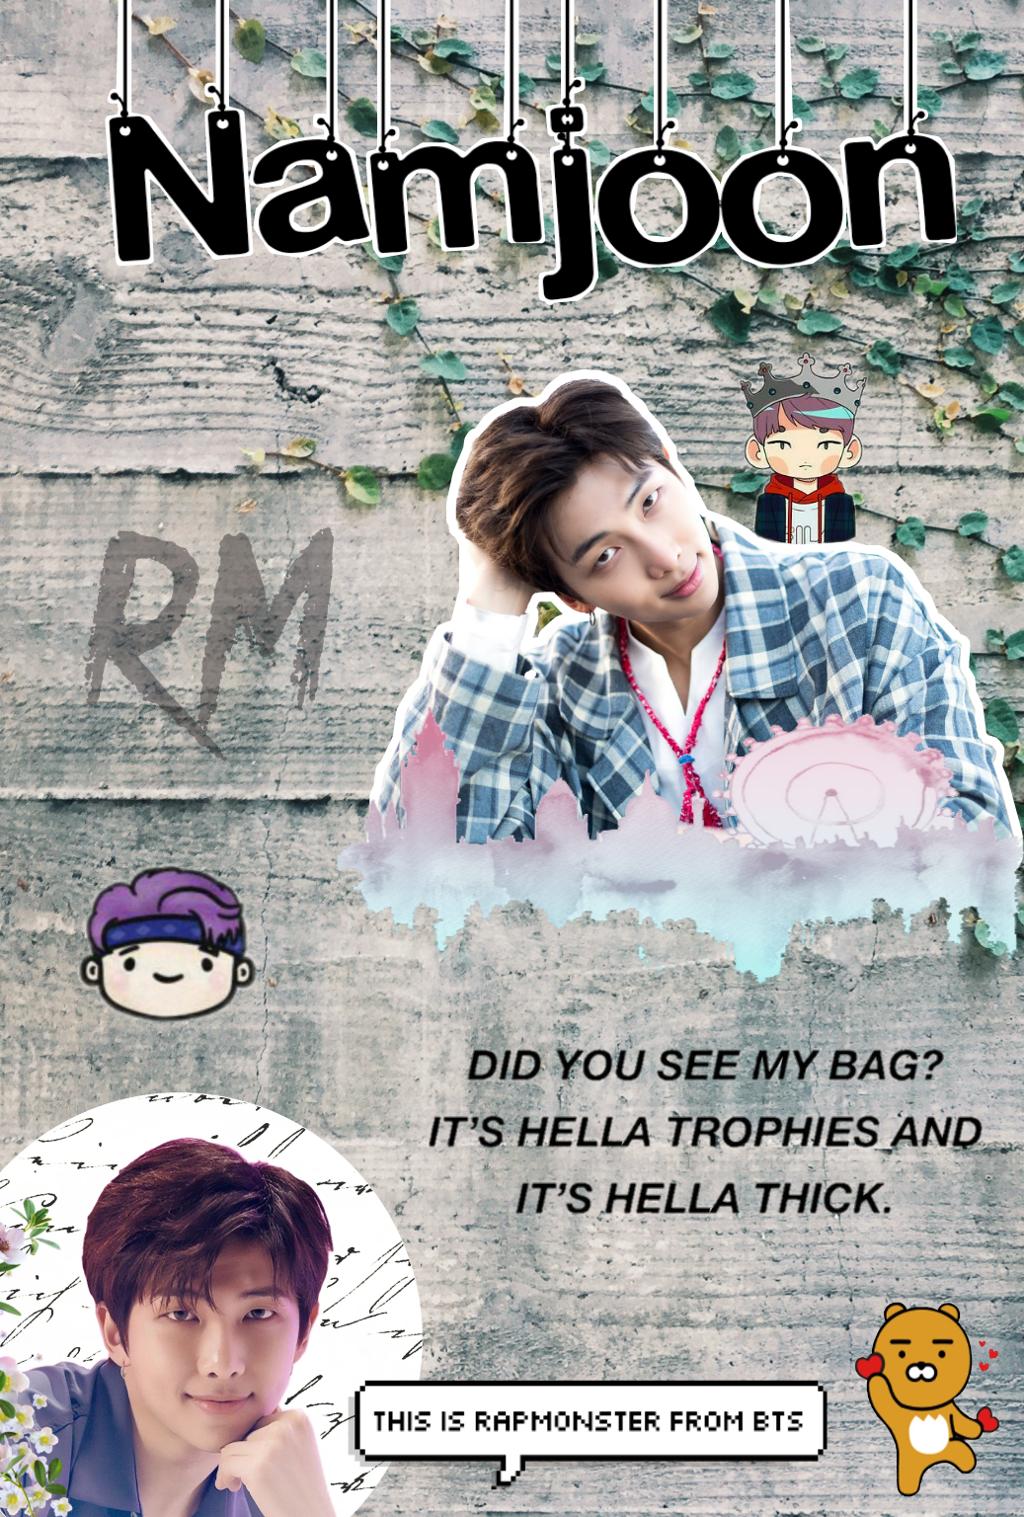 Rm Wallpaper Bts Namjoon Kpop Oppa Poster 828732